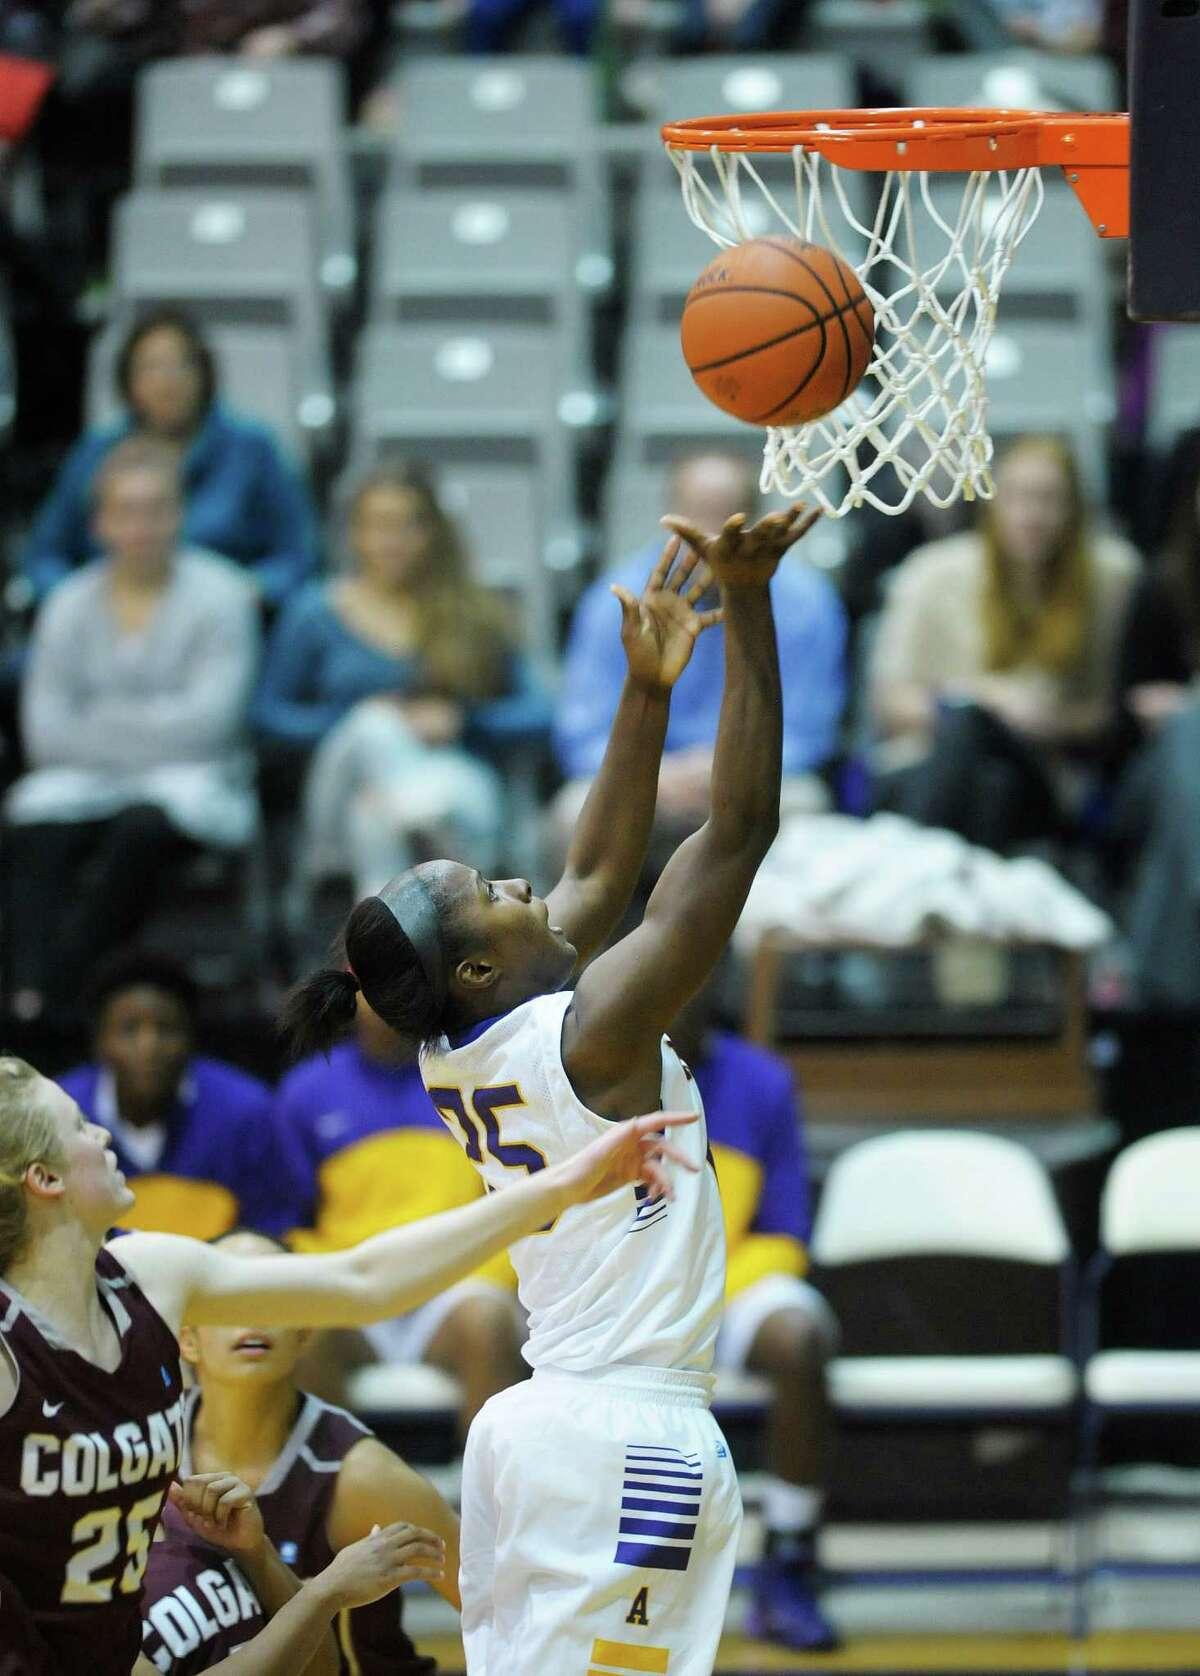 Shereesha Richards of UAlbany puts up a shot during the UAlbany and Colgate women's basketball game on Sunday, Dec. 22, 2013 in Albany, NY. (Paul Buckowski / Times Union)